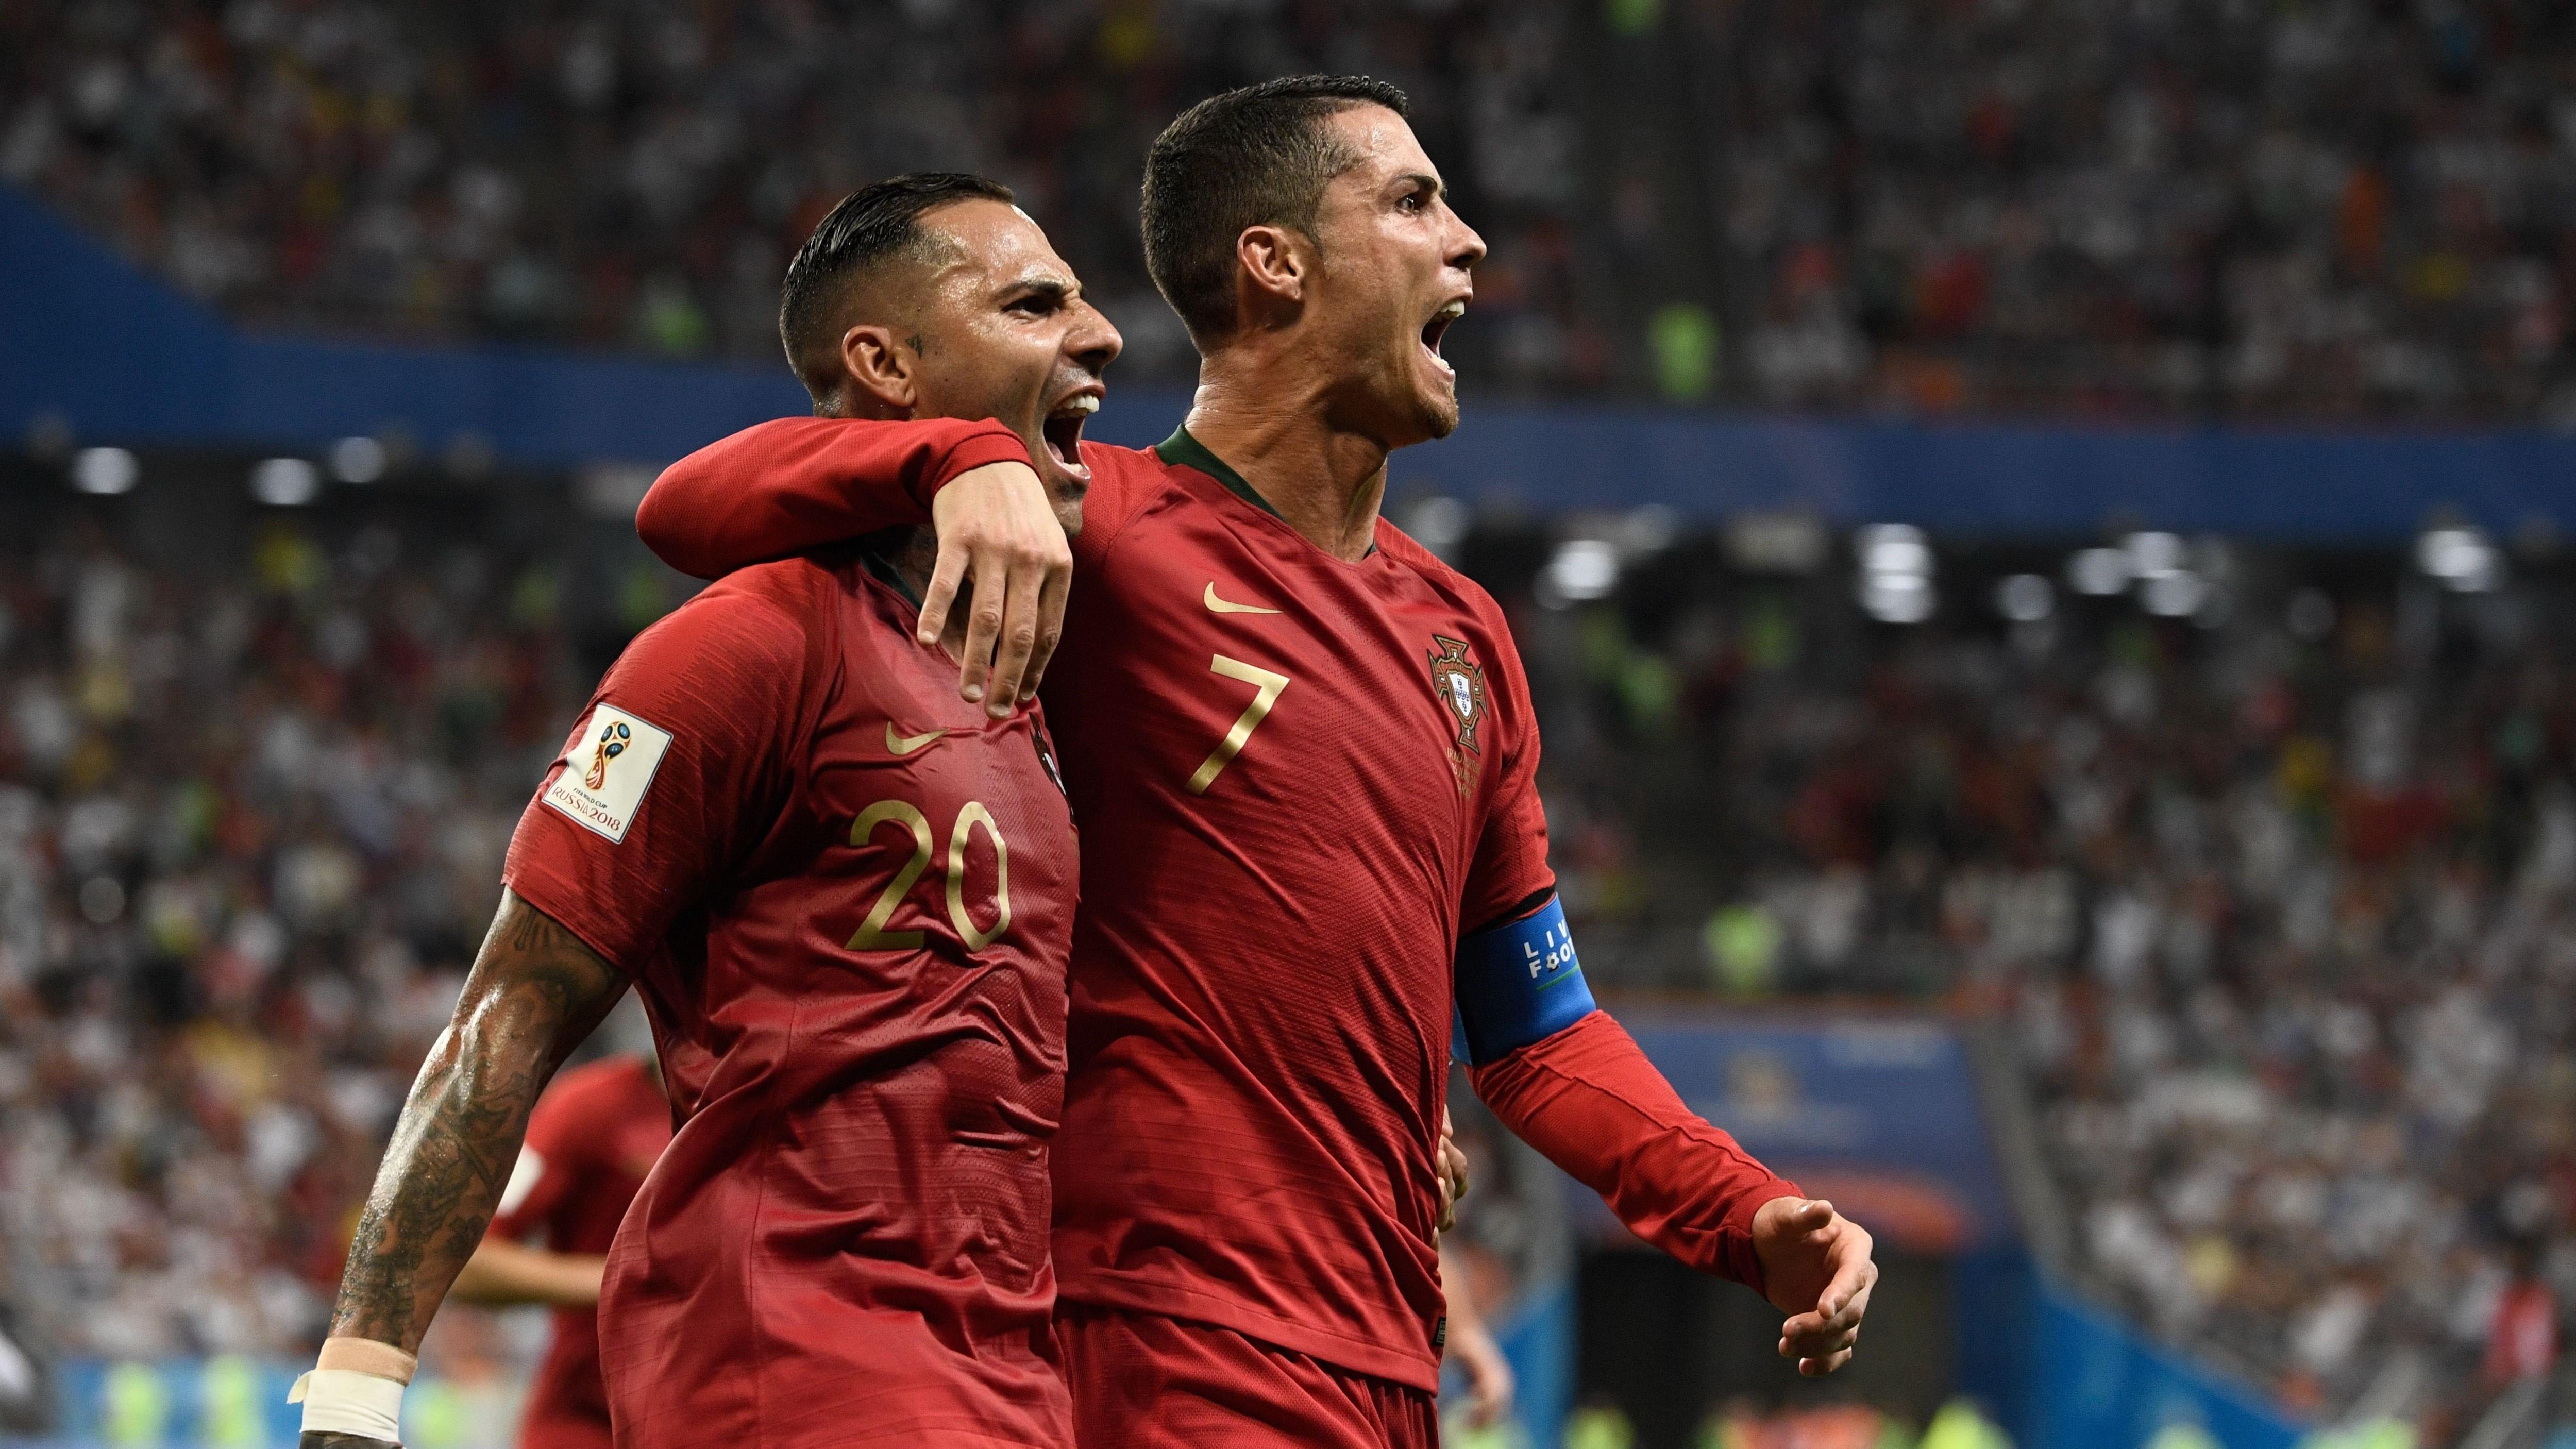 Ricardo Quaresma Cristiano Ronaldo Iran Portugal Spain Morocco España Marruecos 25062018